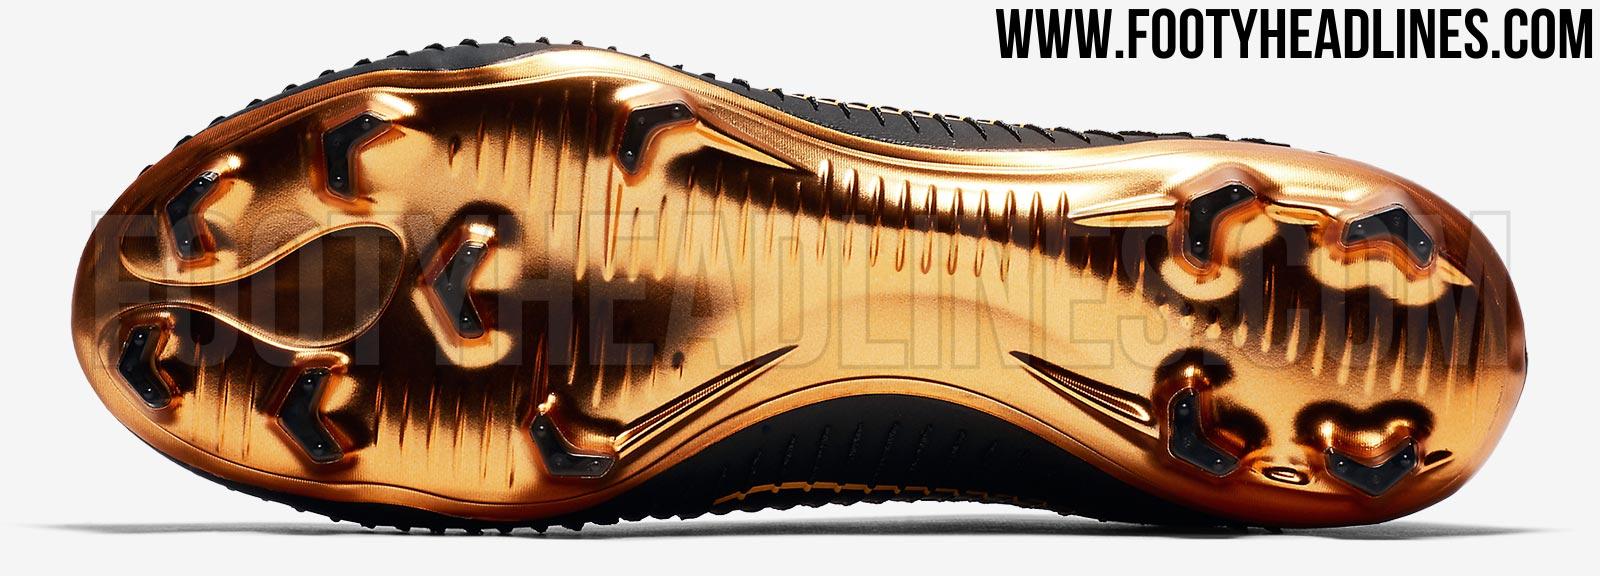 Sortie Nike Or Métallique Flyknit Ultra Chaussures Des Noir qUpSVGzM